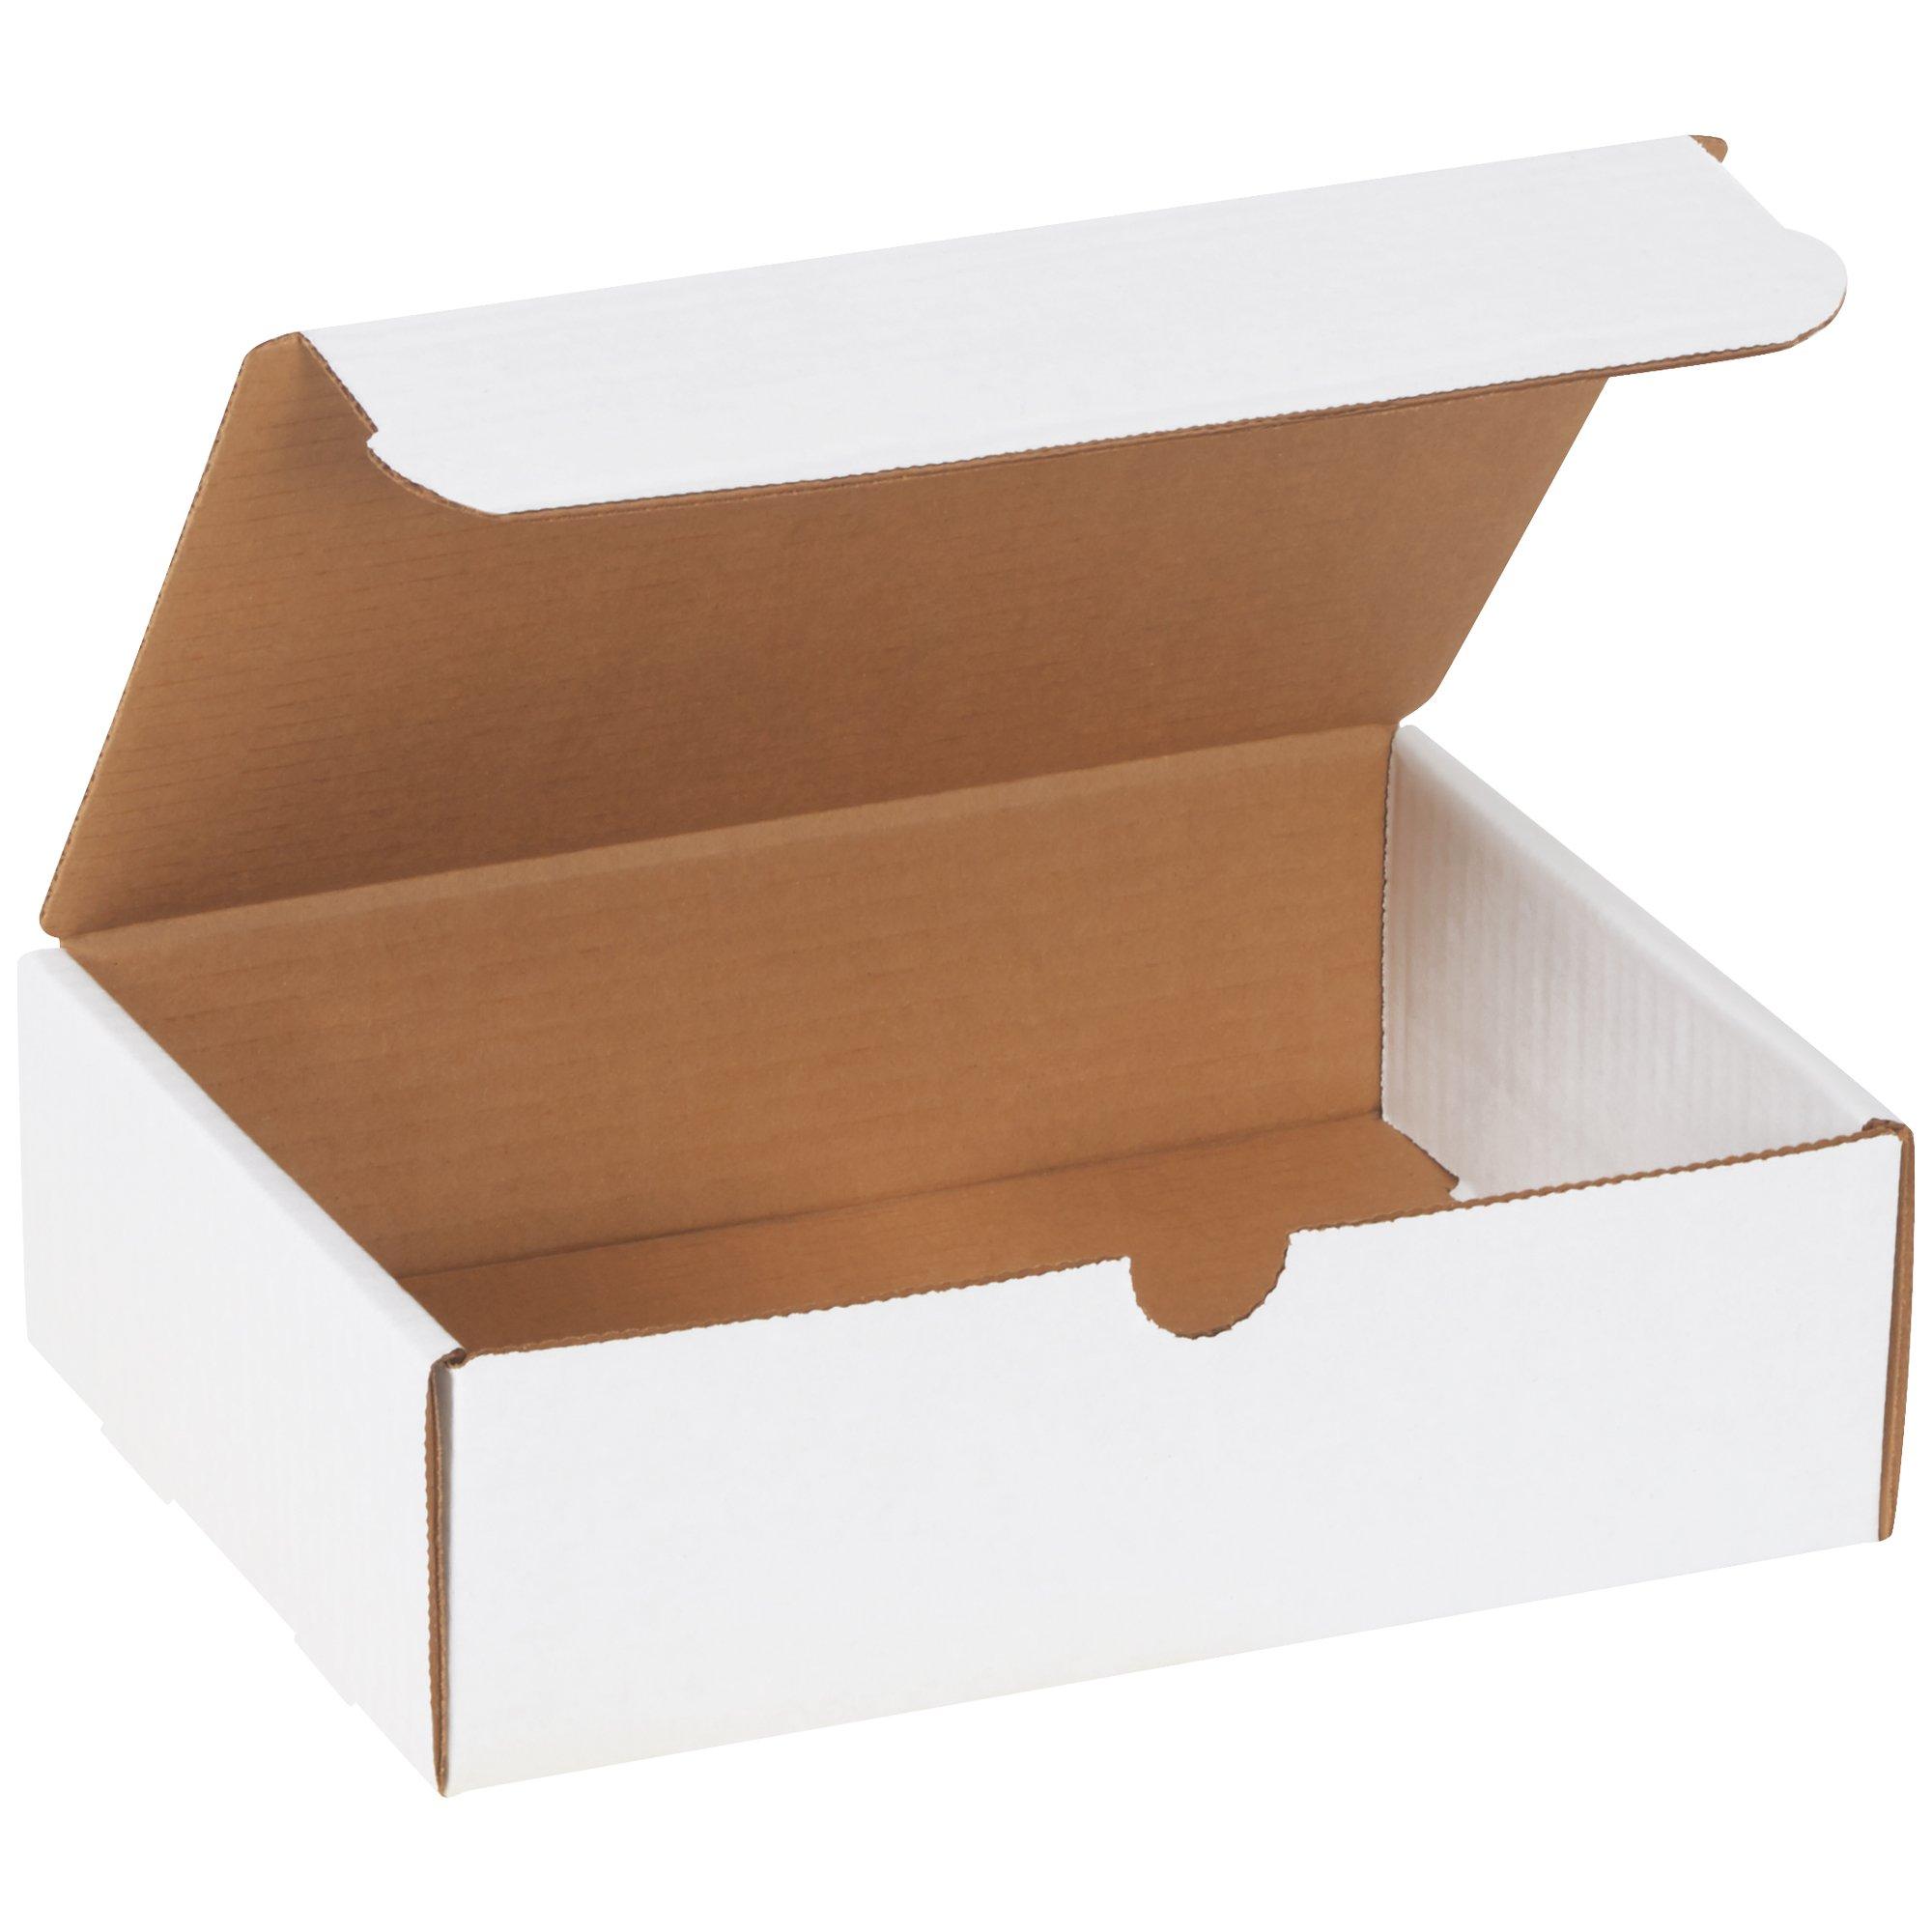 BOX USA BM962100PK Literature Mailers, 9''L x 6-1/2''W x 2-3/4''H, White (Pack of 100)